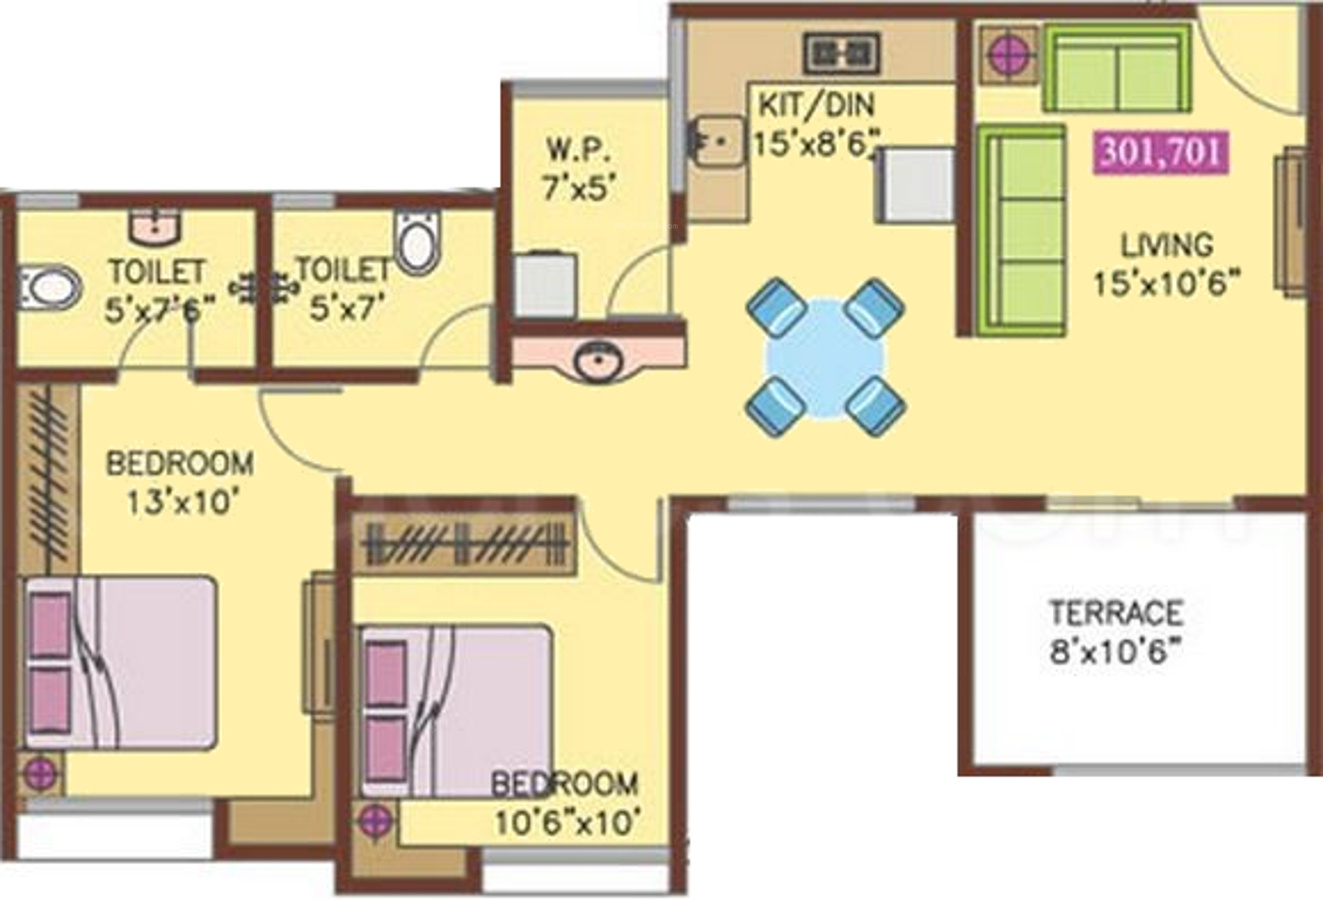 wyndham kingsgate floor plans modern home design and